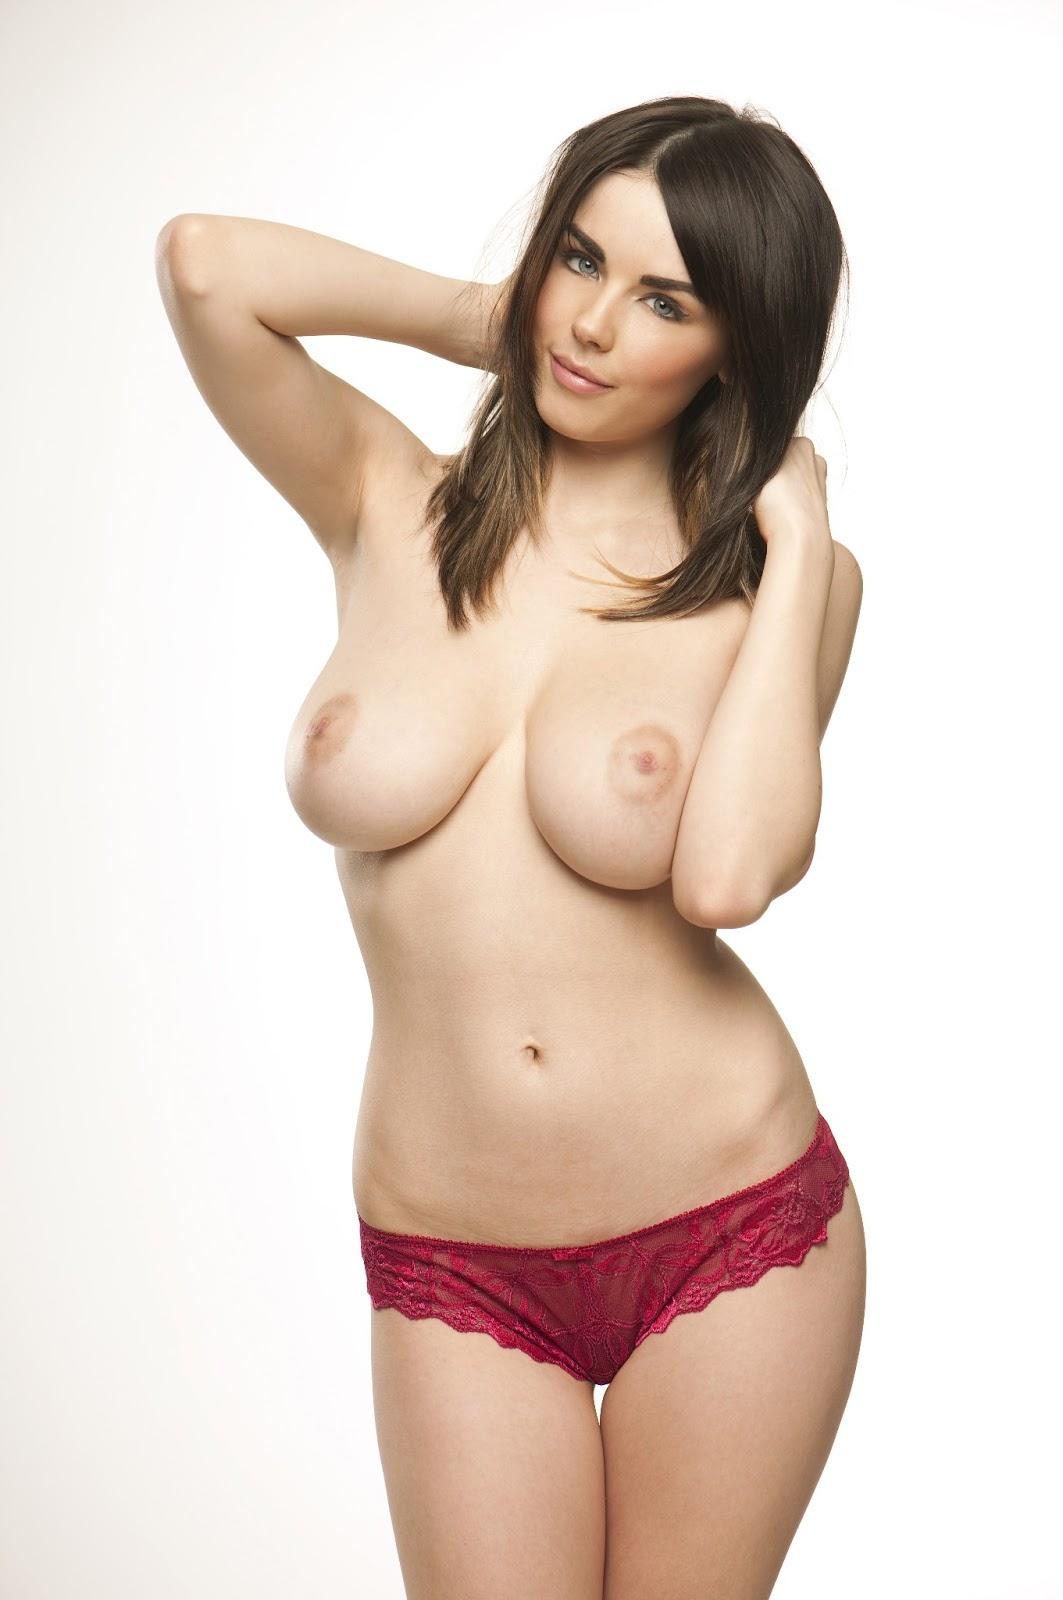 danielle sharp nude